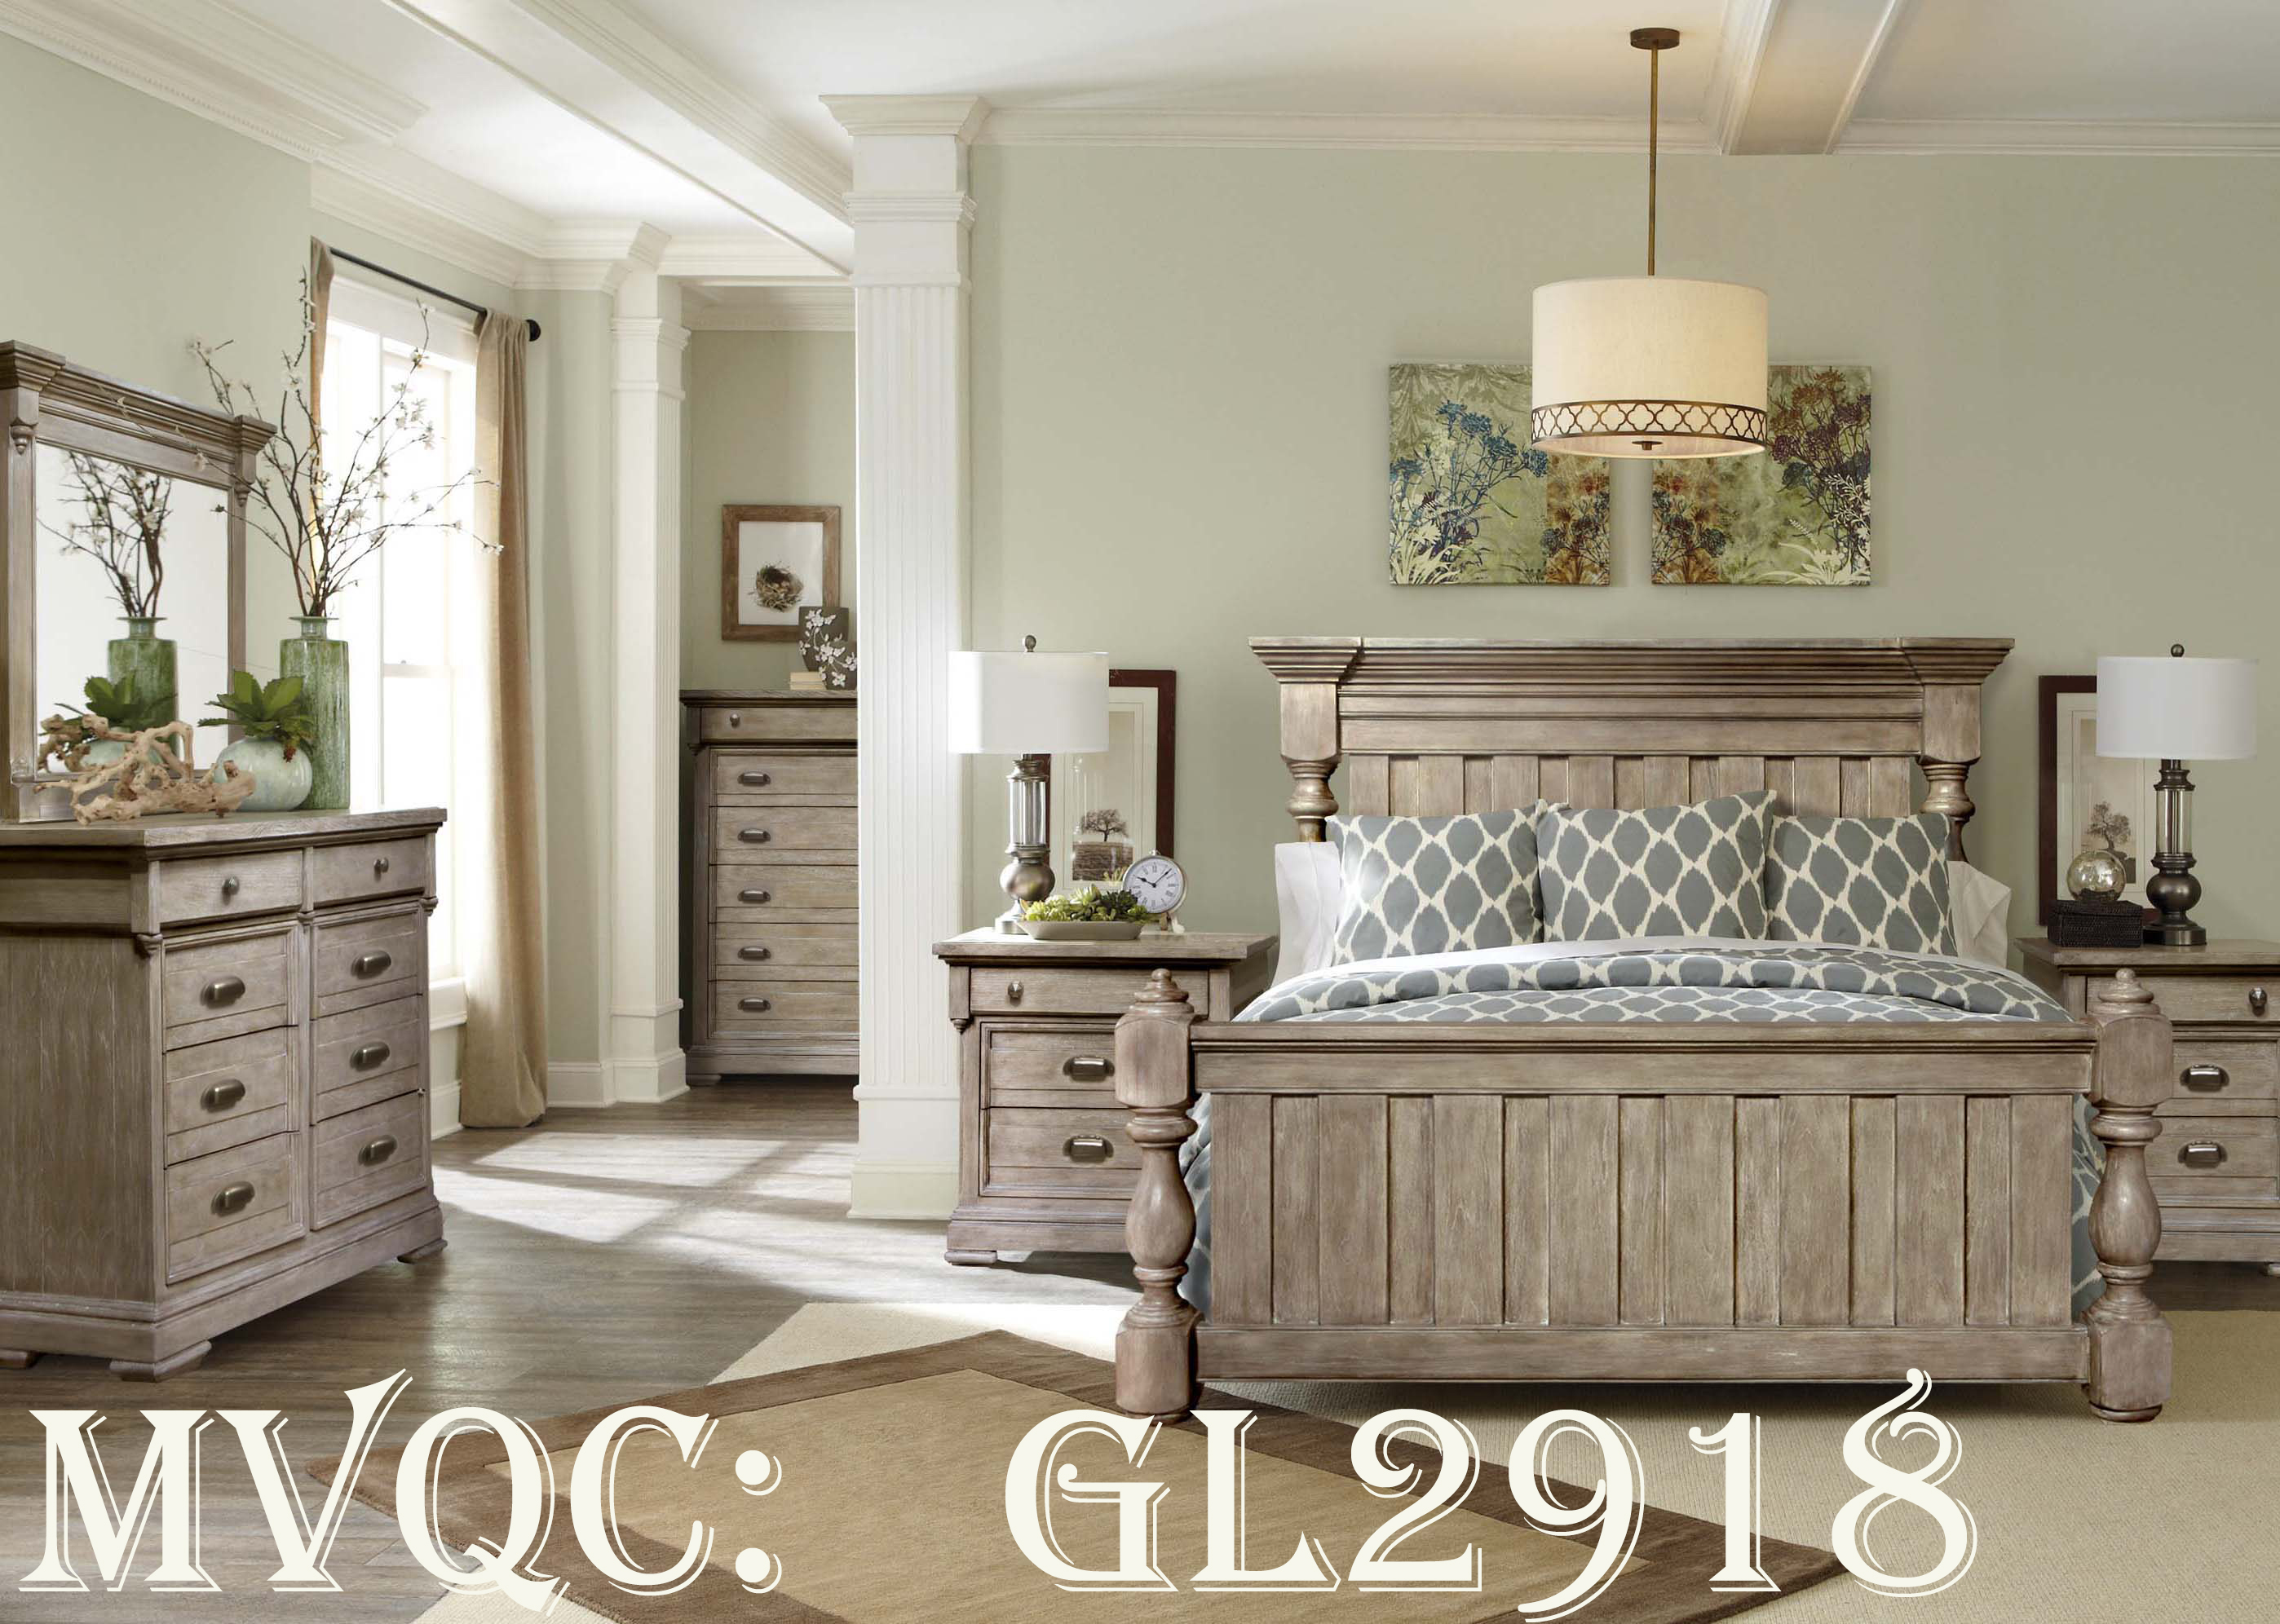 GL2918